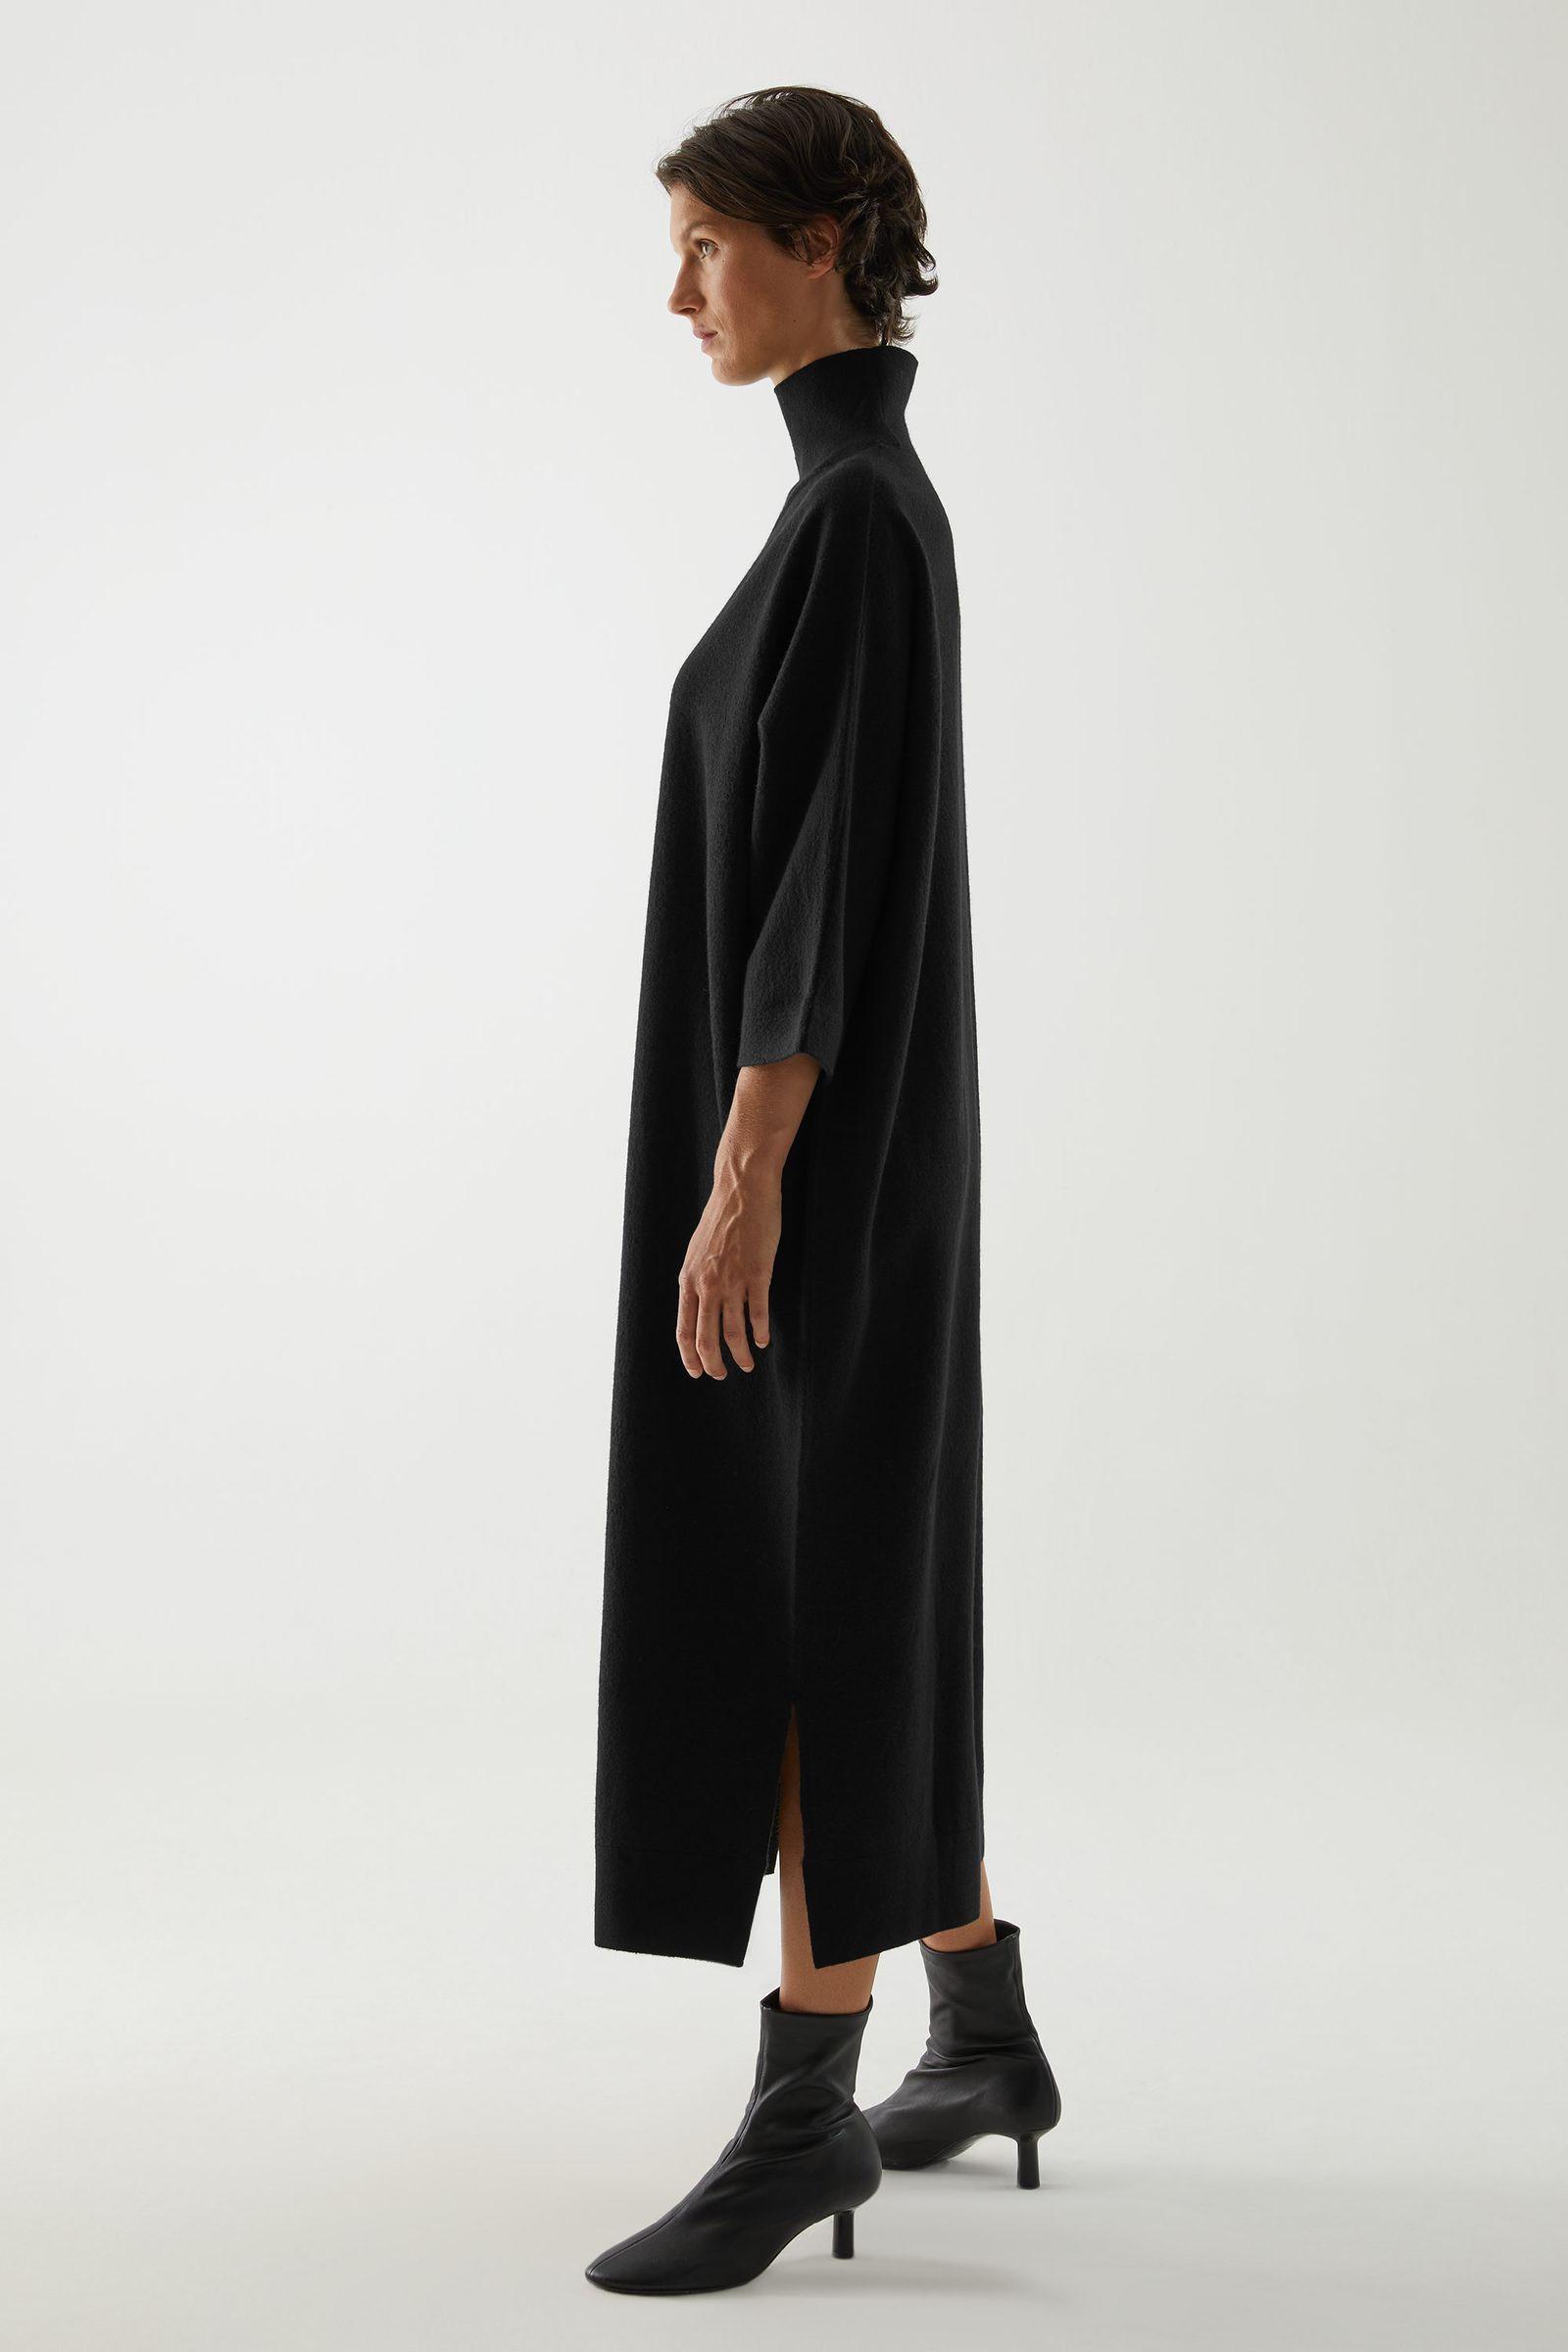 COS 메리노 울 롤넥 니티드 맥시 드레스의 블랙컬러 ECOMLook입니다.